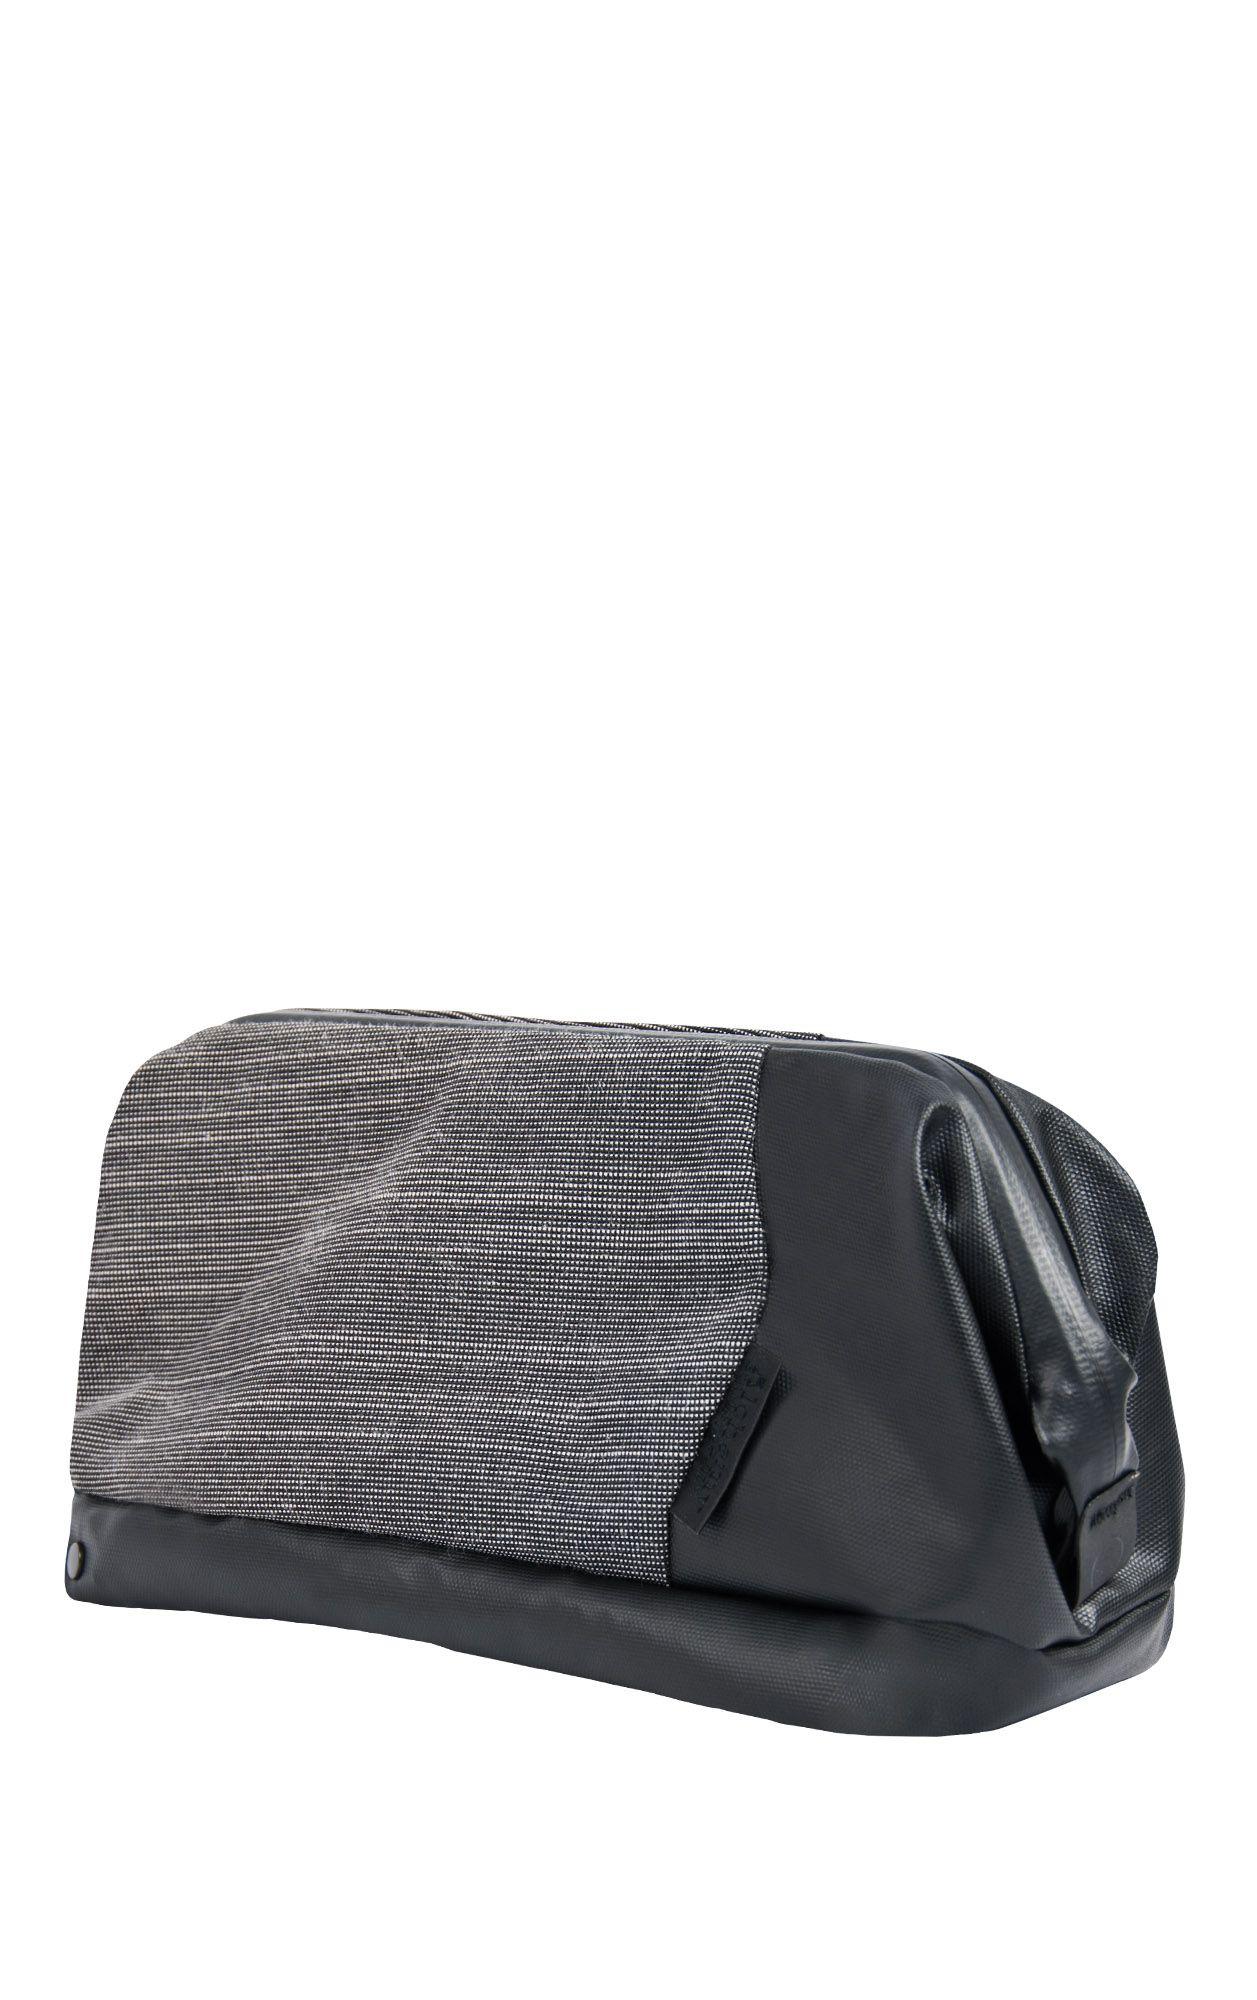 DOPP KIT BAG Dopp Kit, Travel Style, Fashion Bags, Carry On, Fashion 230c50df58